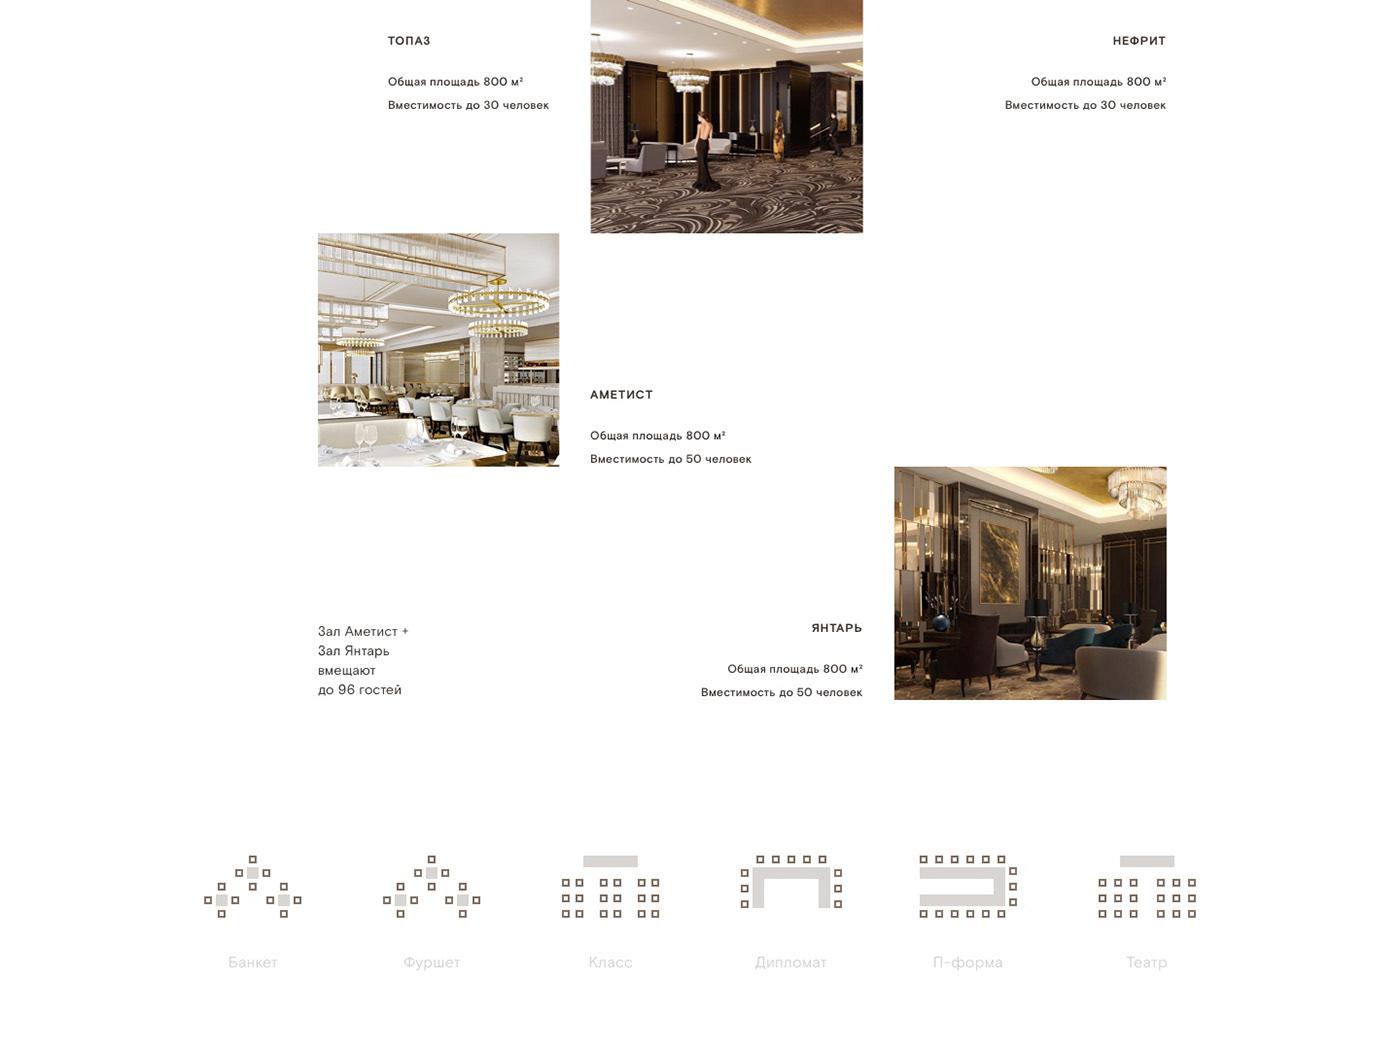 luxury hotel rooms Booking samara luxurious Interior site Minimalism trend